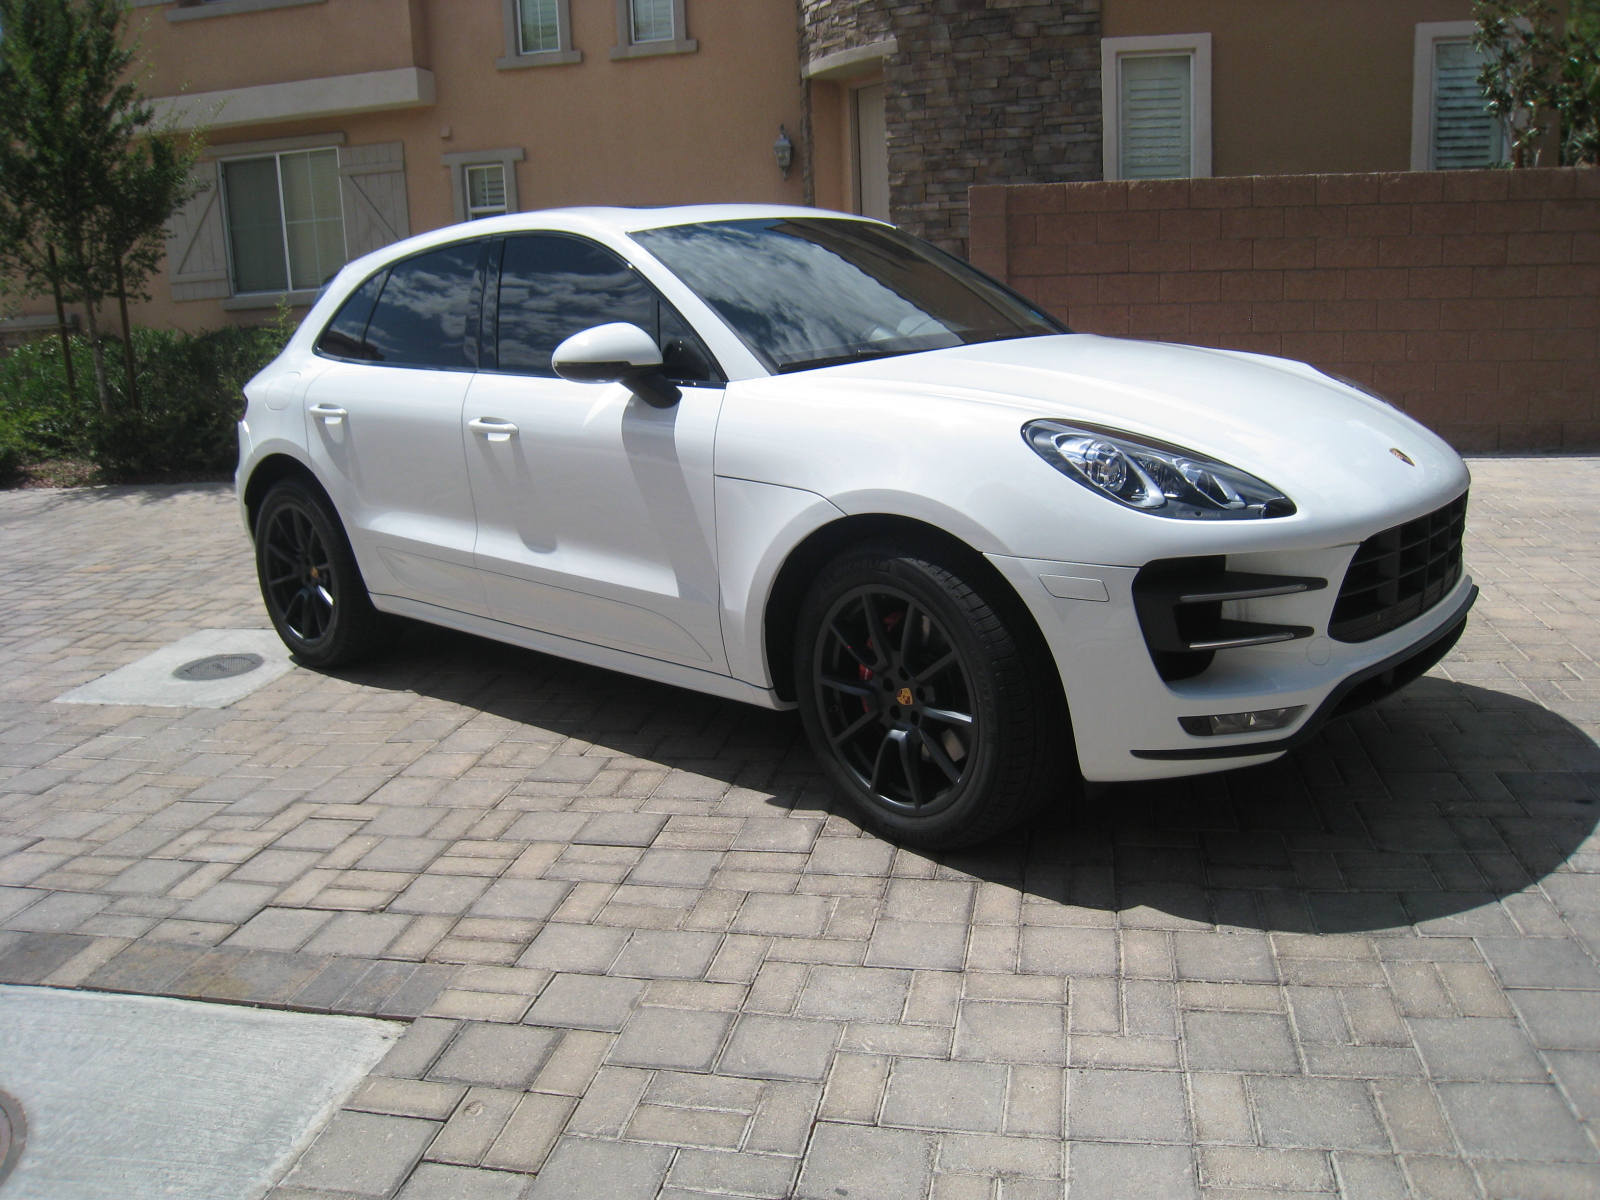 Porsche Macan Rims In Black Page 2 Porsche Macan Forum